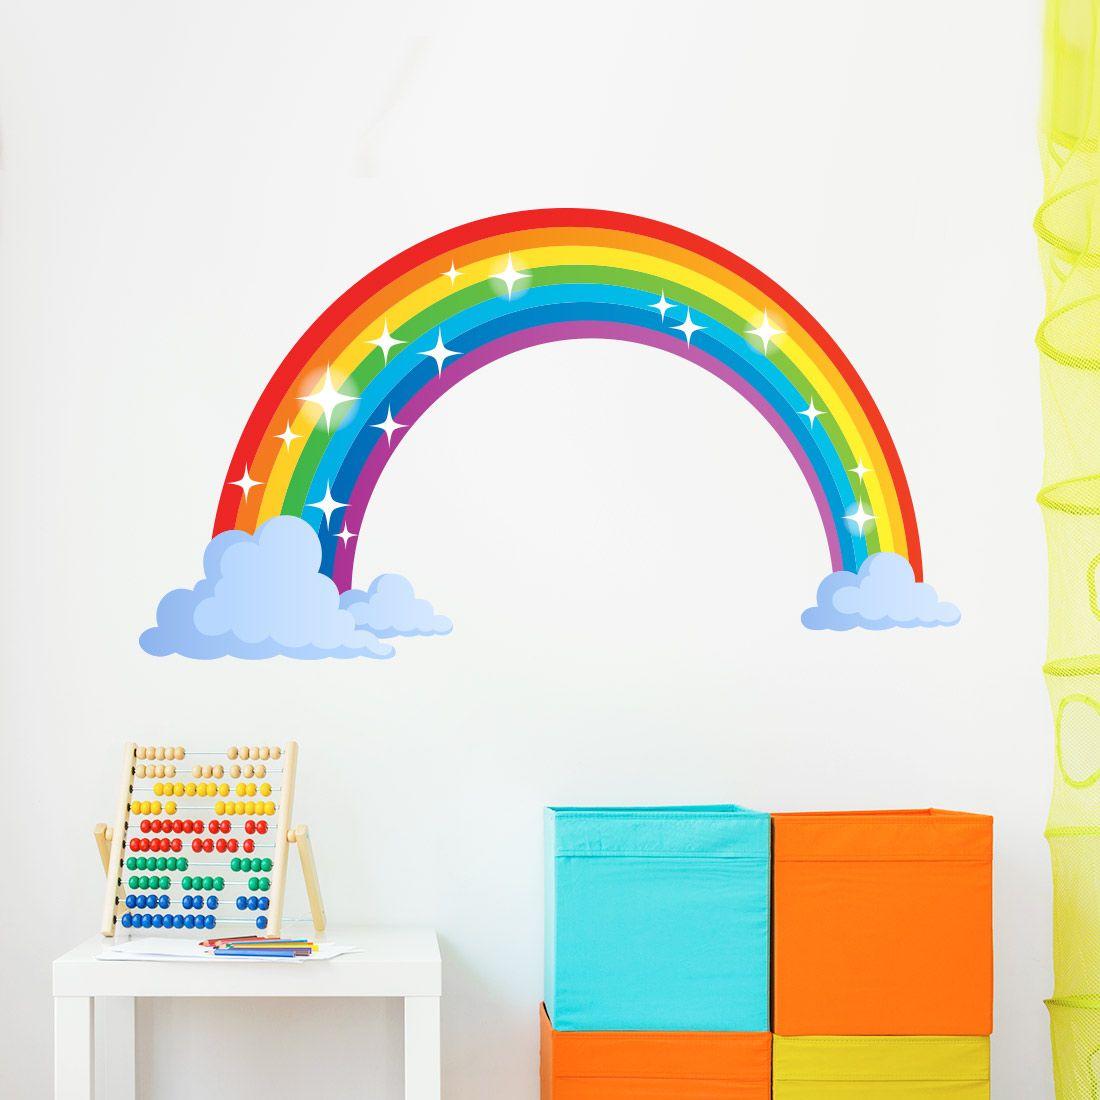 Muurstickers Kinderkamer Goedkoop.Regenboog Muursticker Kinderkamer In 2019 Regenboog